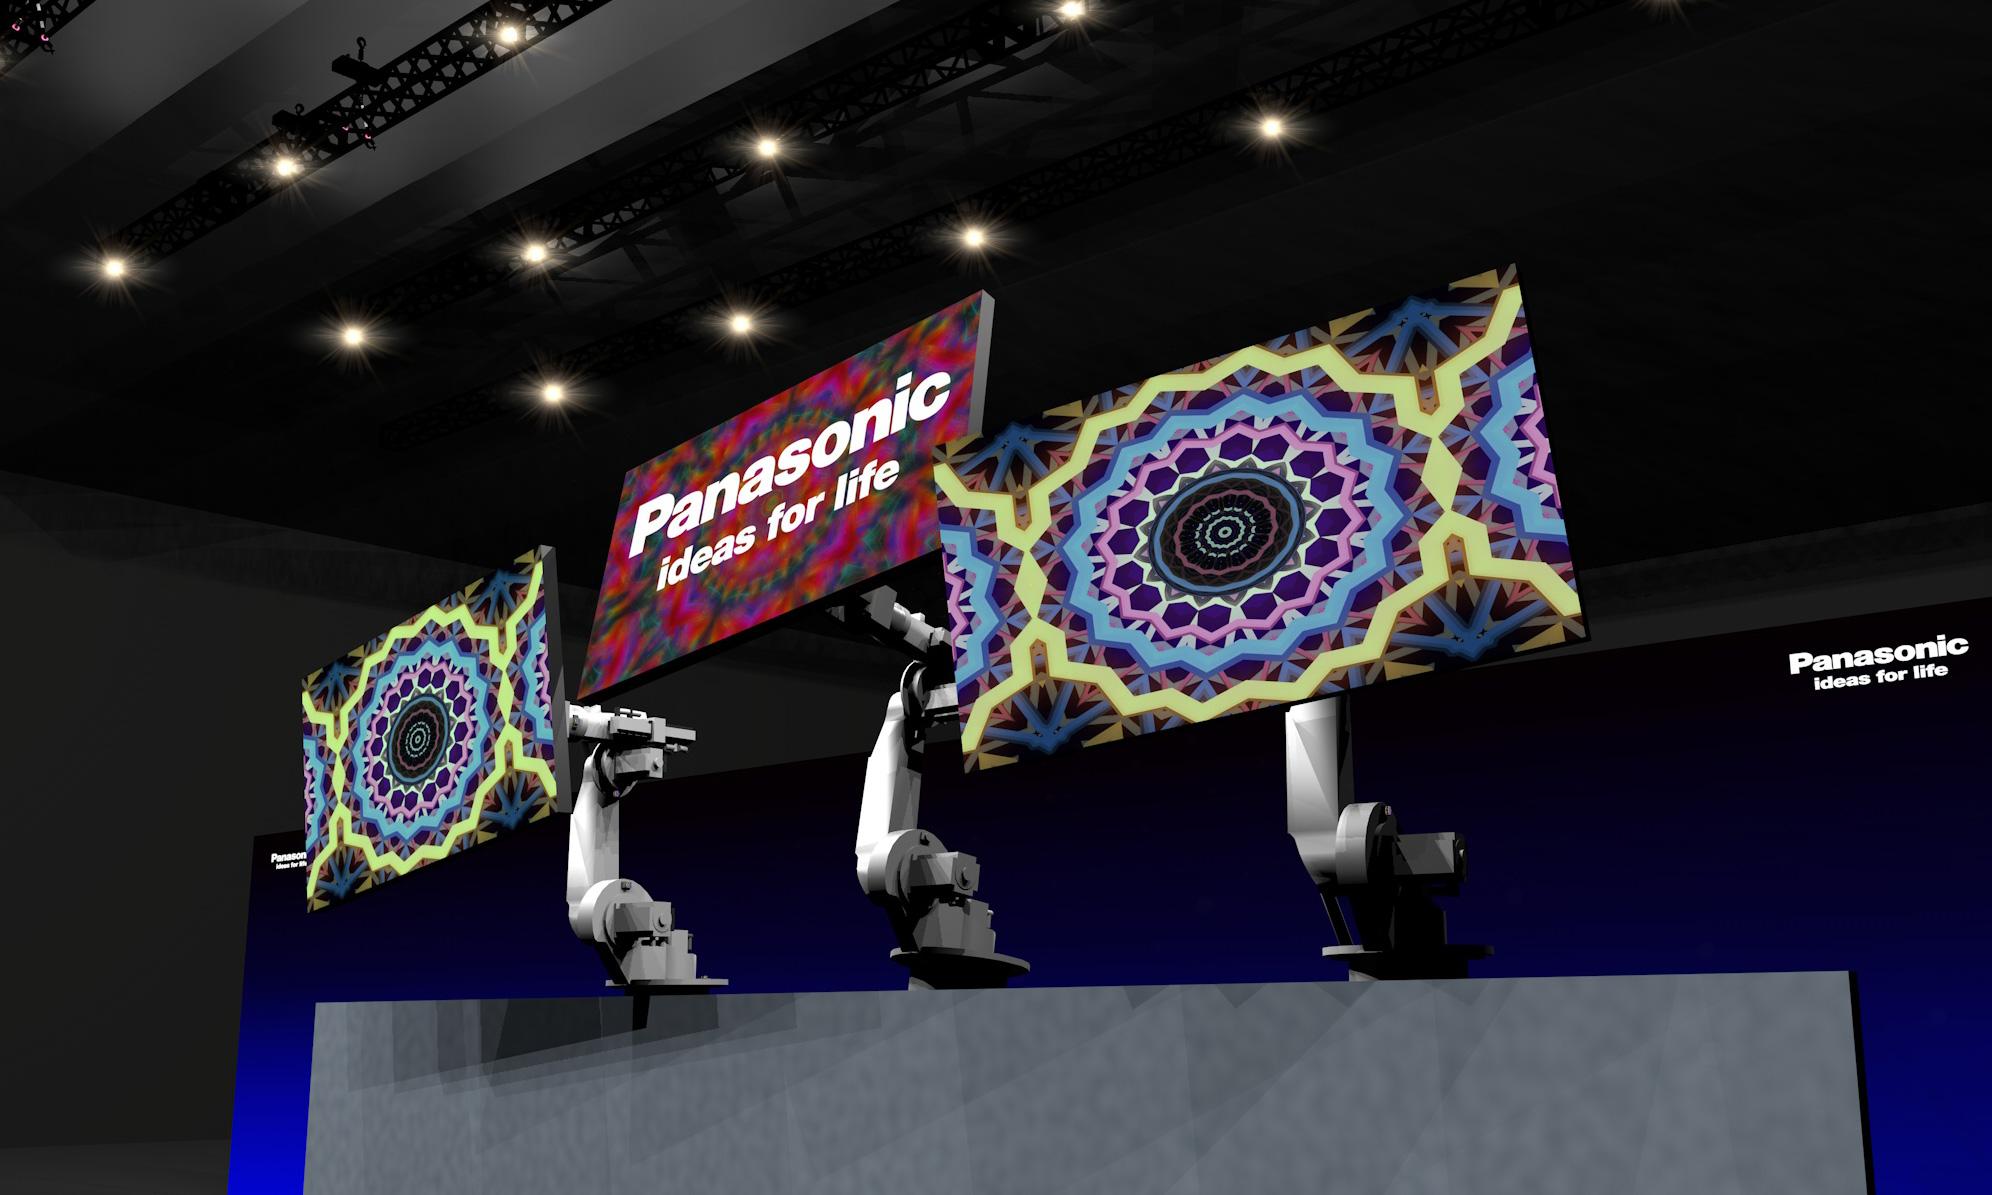 Panasonic Planung ISE Amsterdam